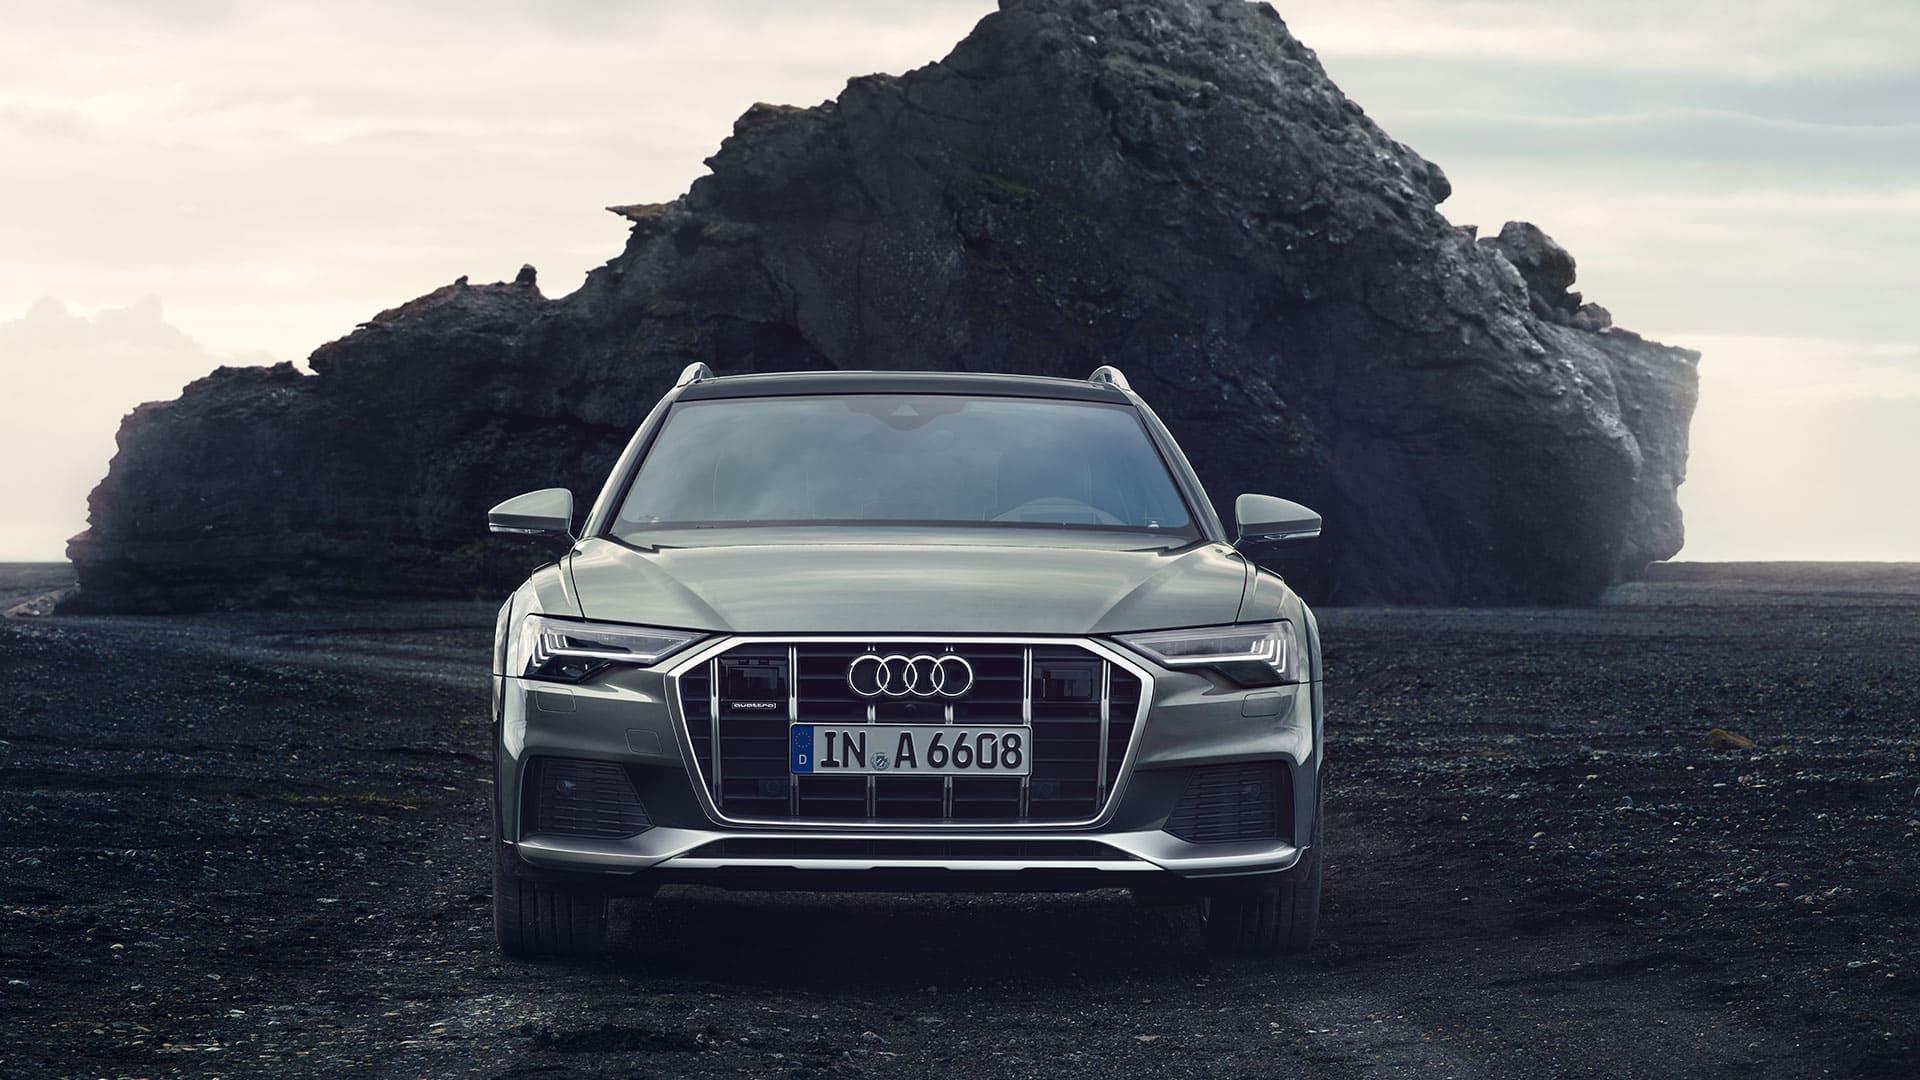 Front view Audi A6 allroad quattro